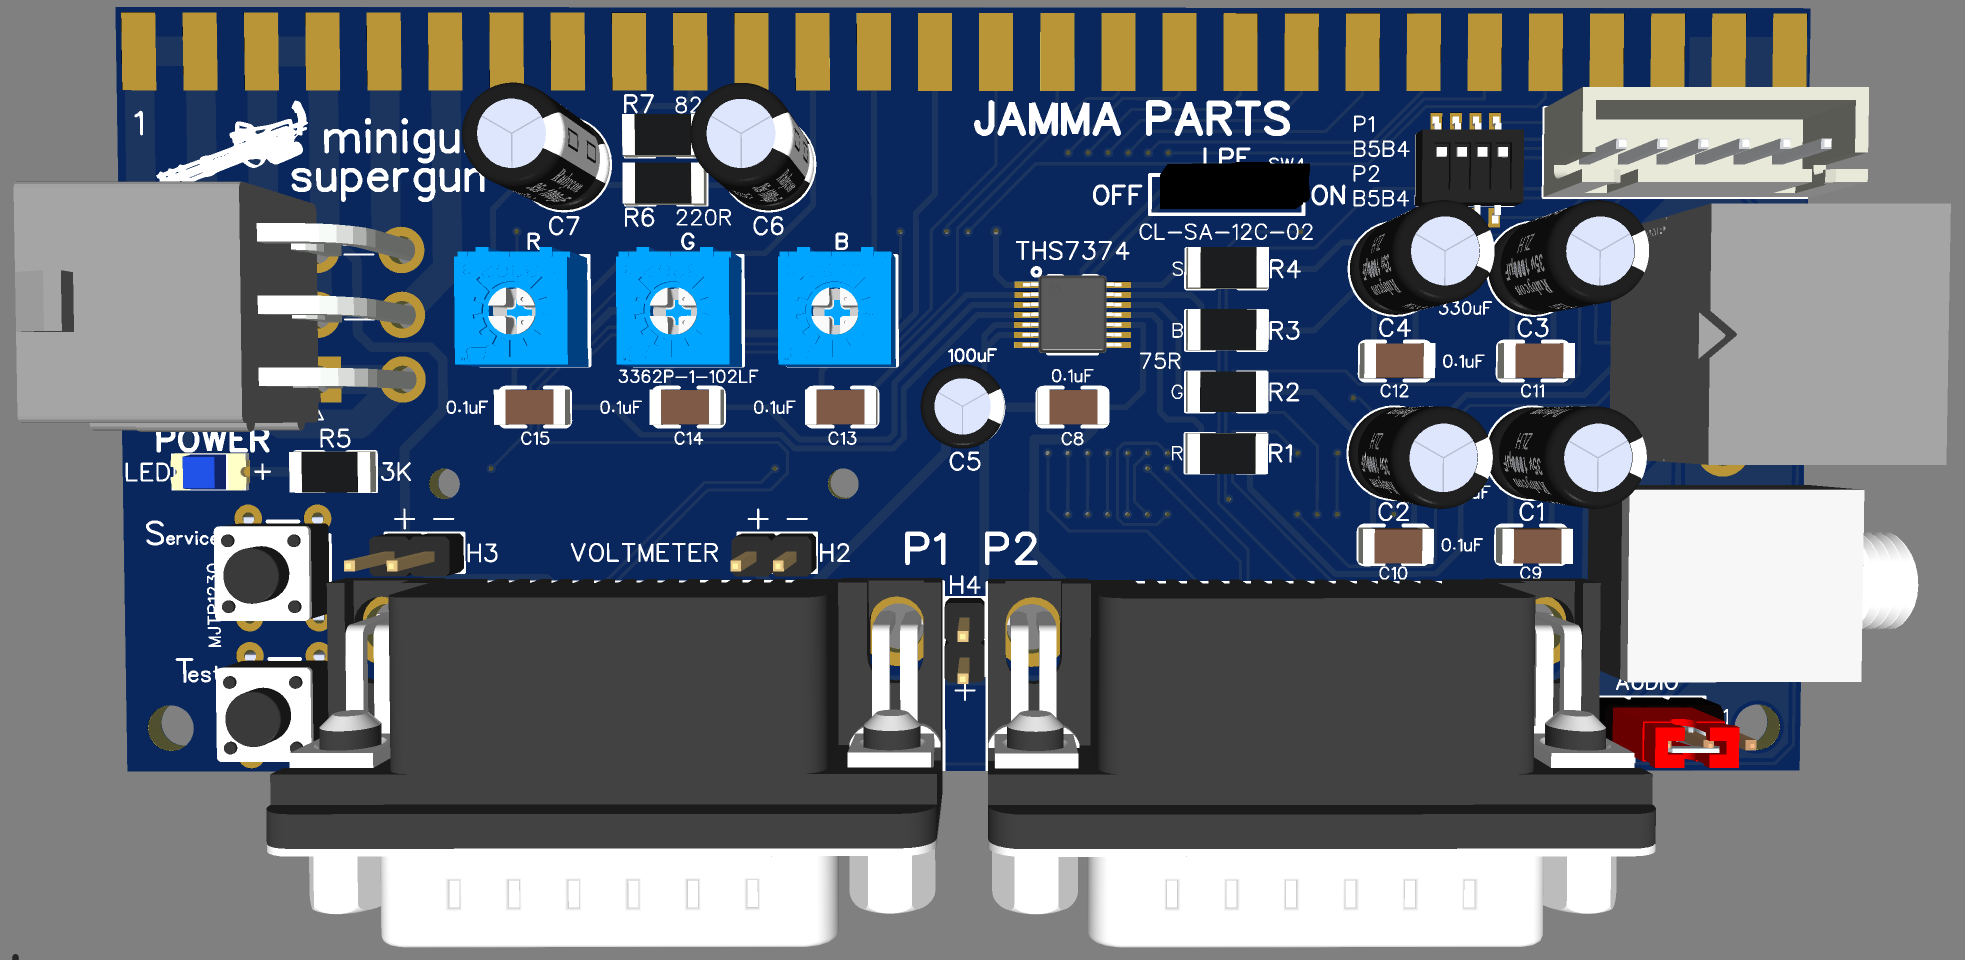 Minigun_3D_R2.5.png